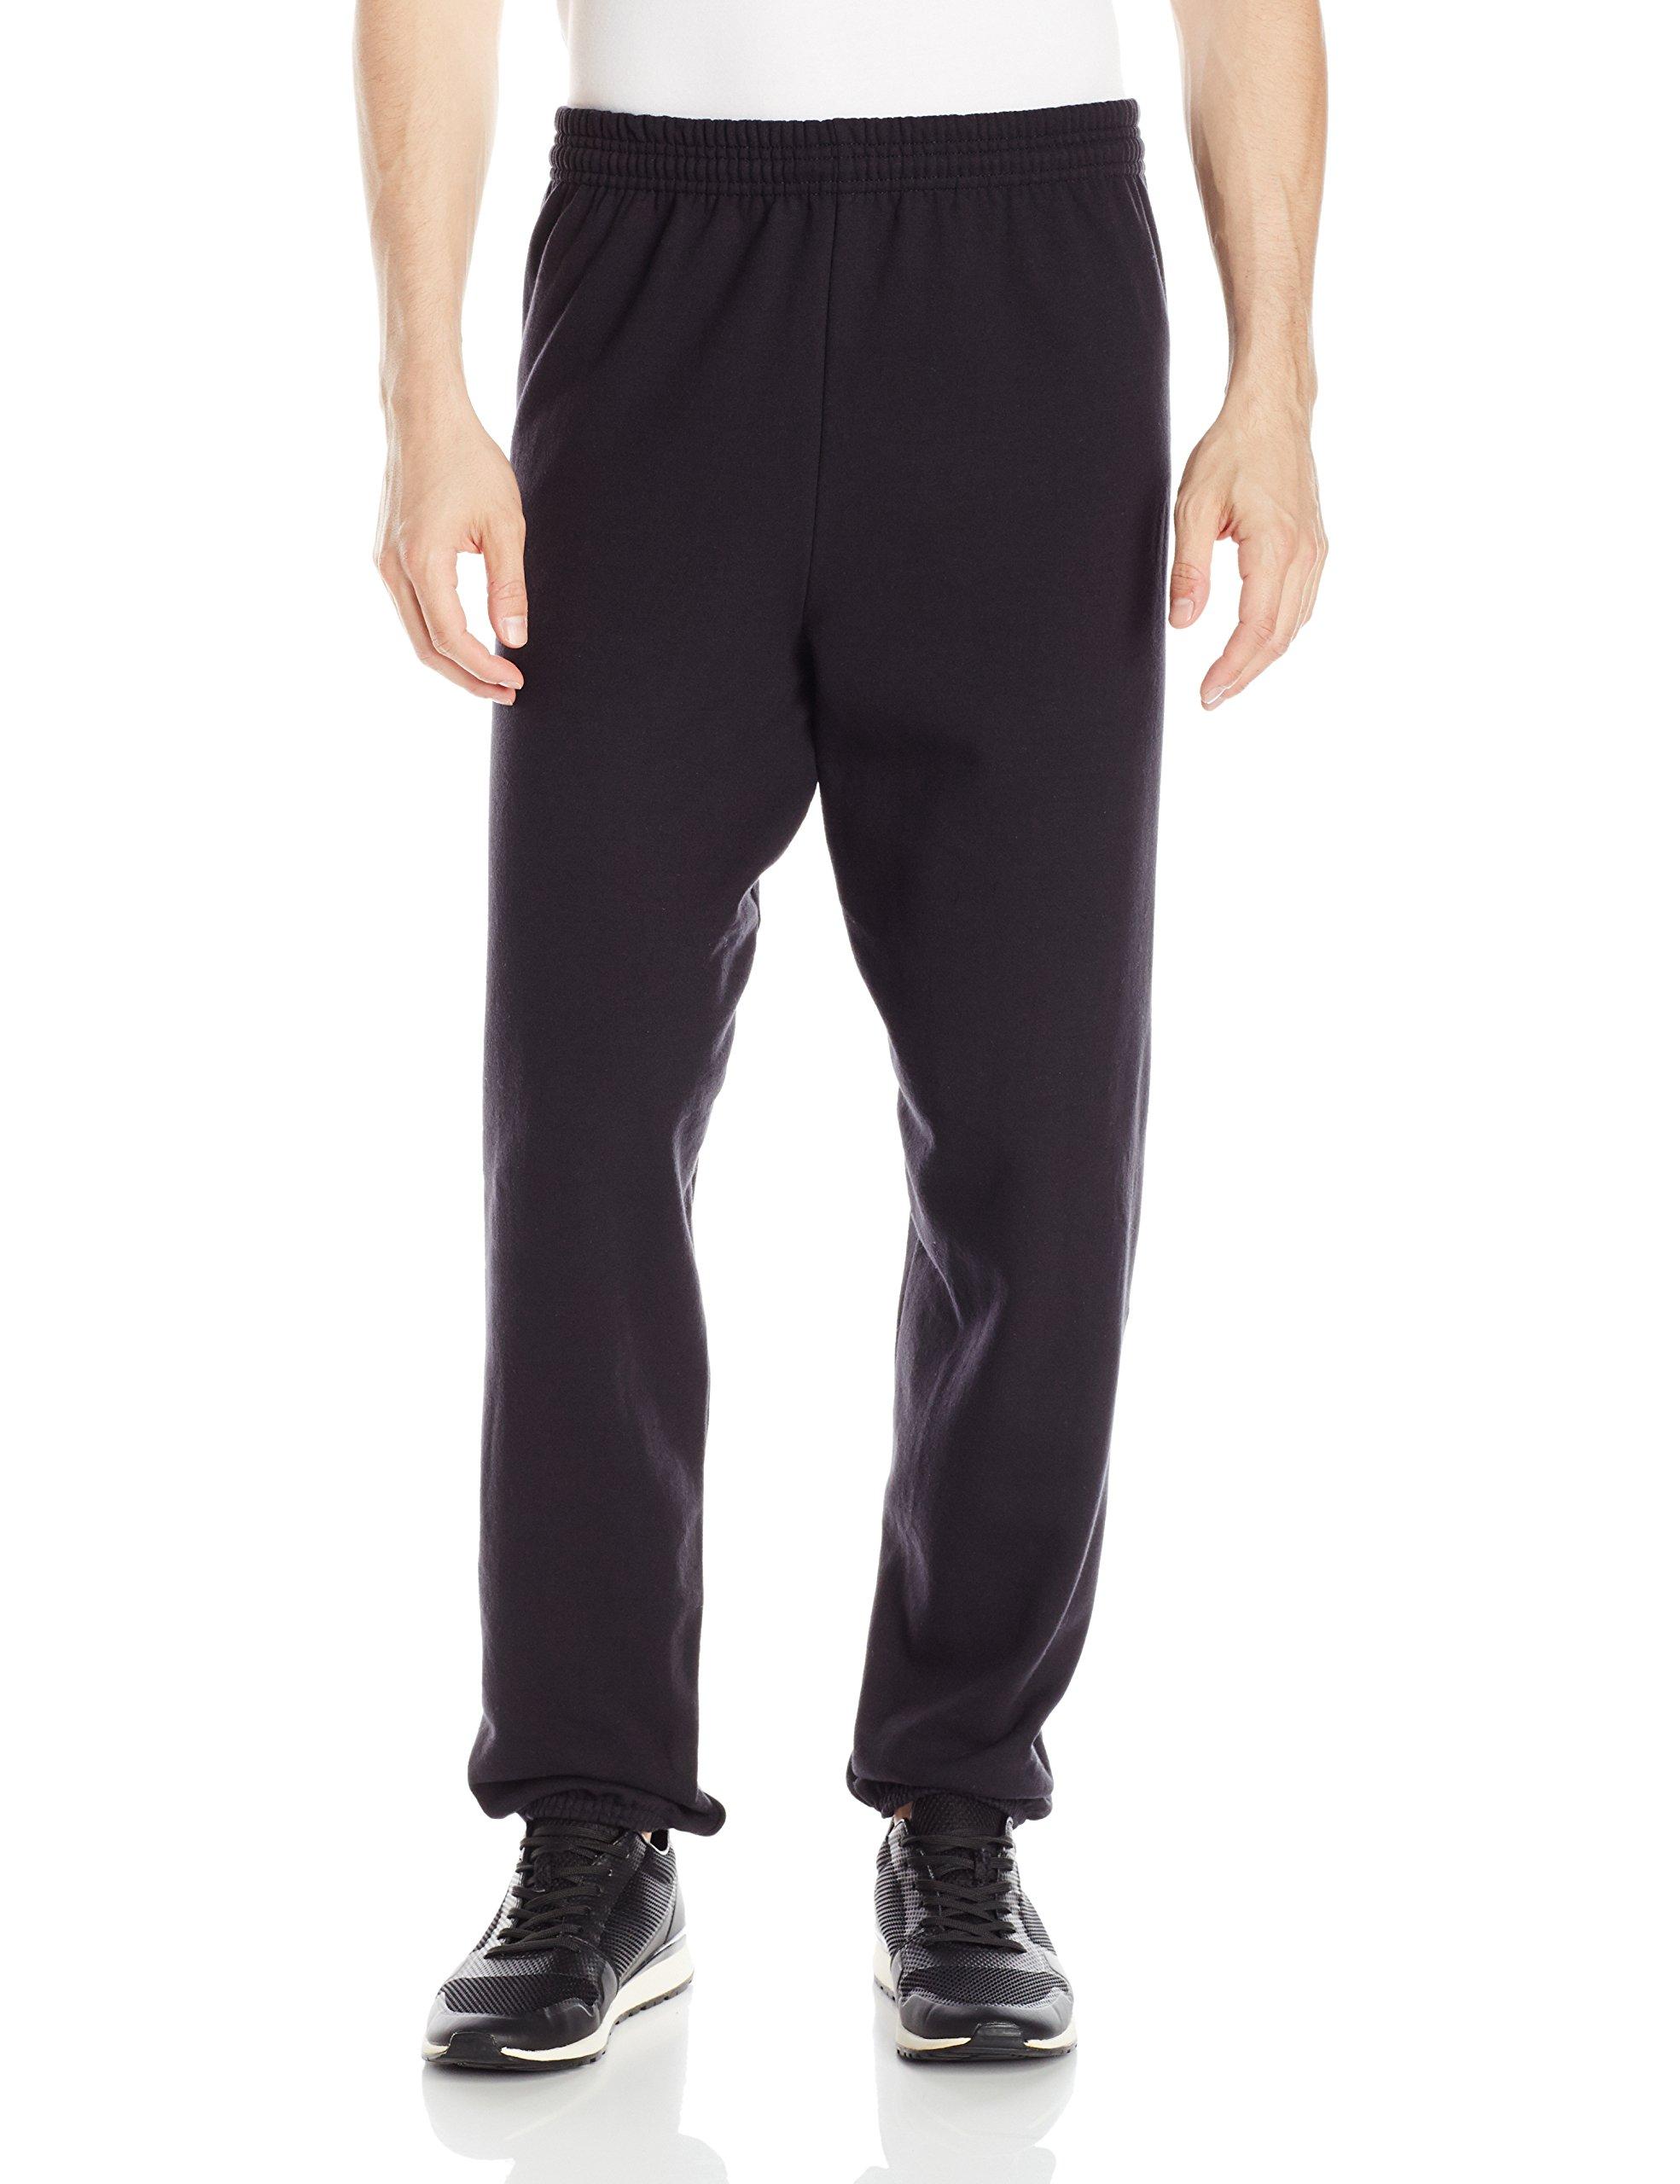 Hanes Men's EcoSmart Fleece Sweatpant, Black, L